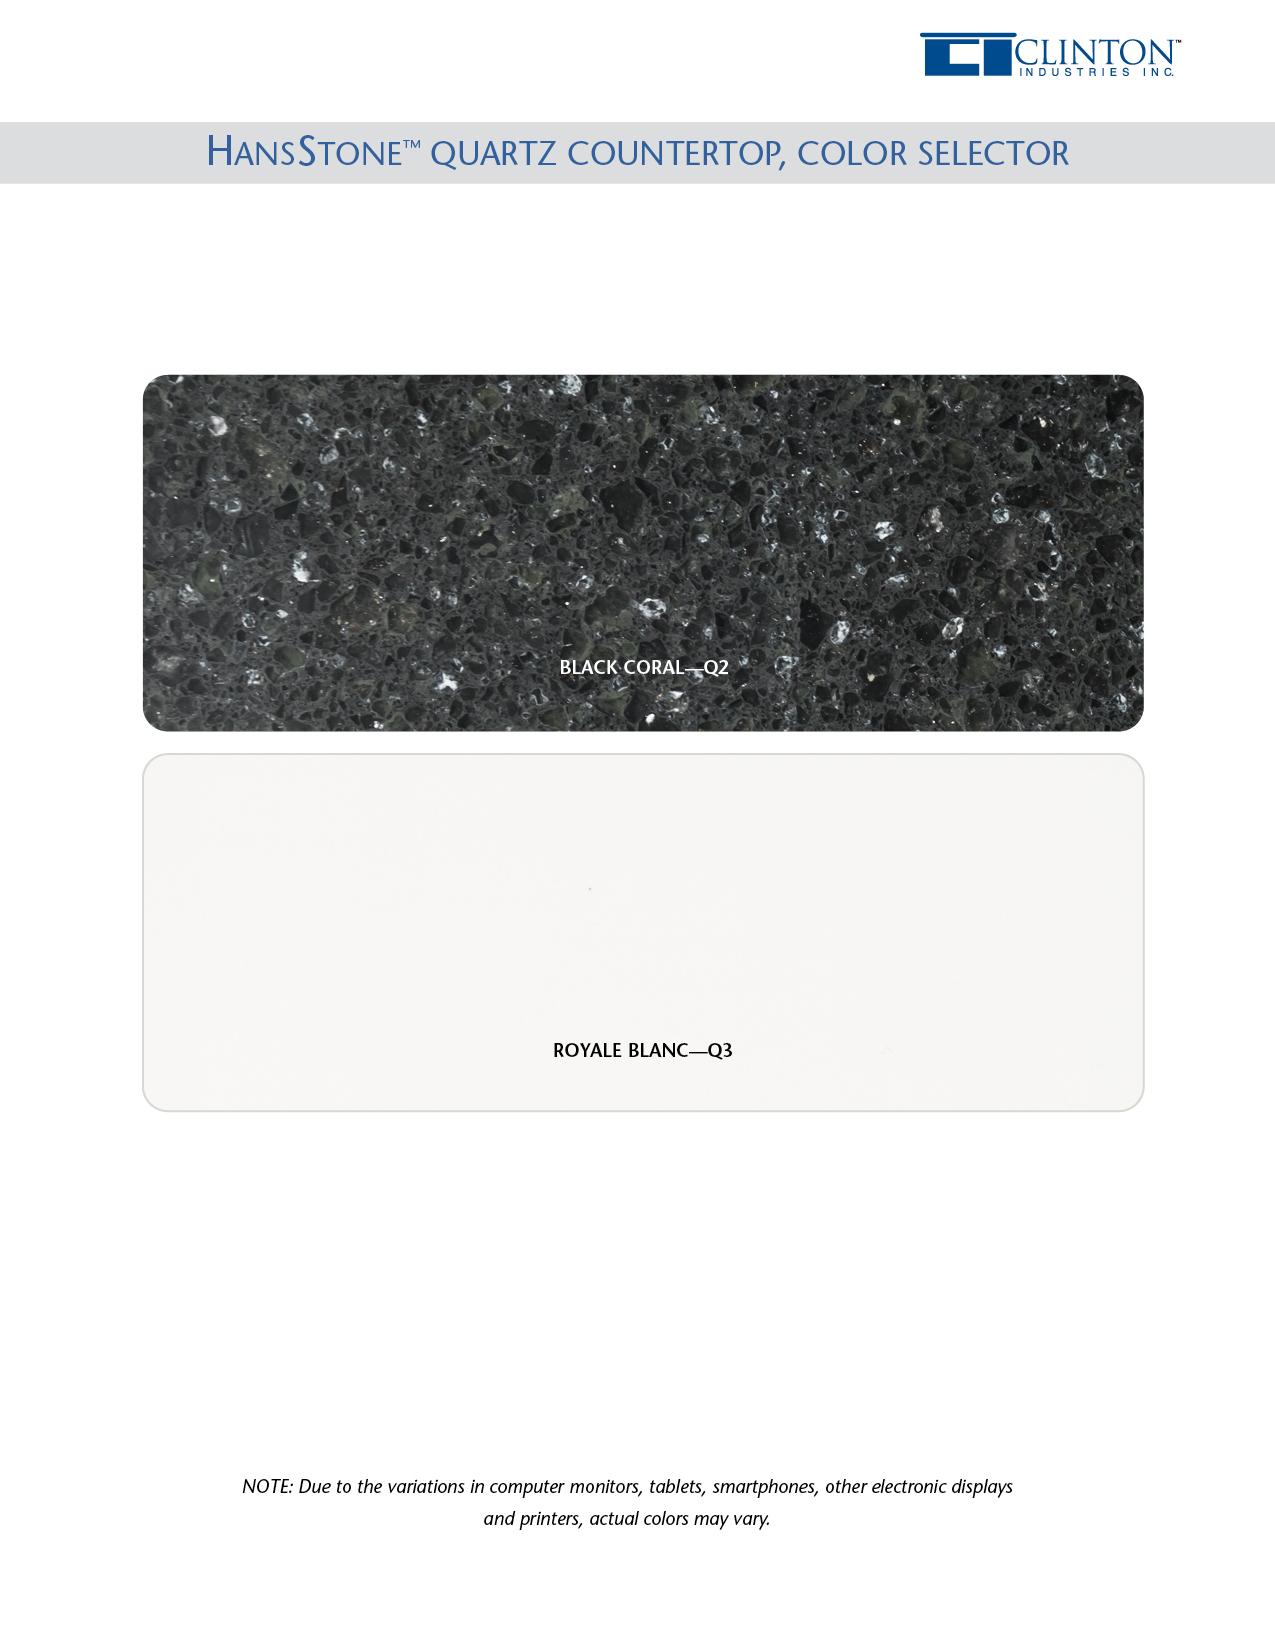 HanStone™ Quartz Countertop Color Selector